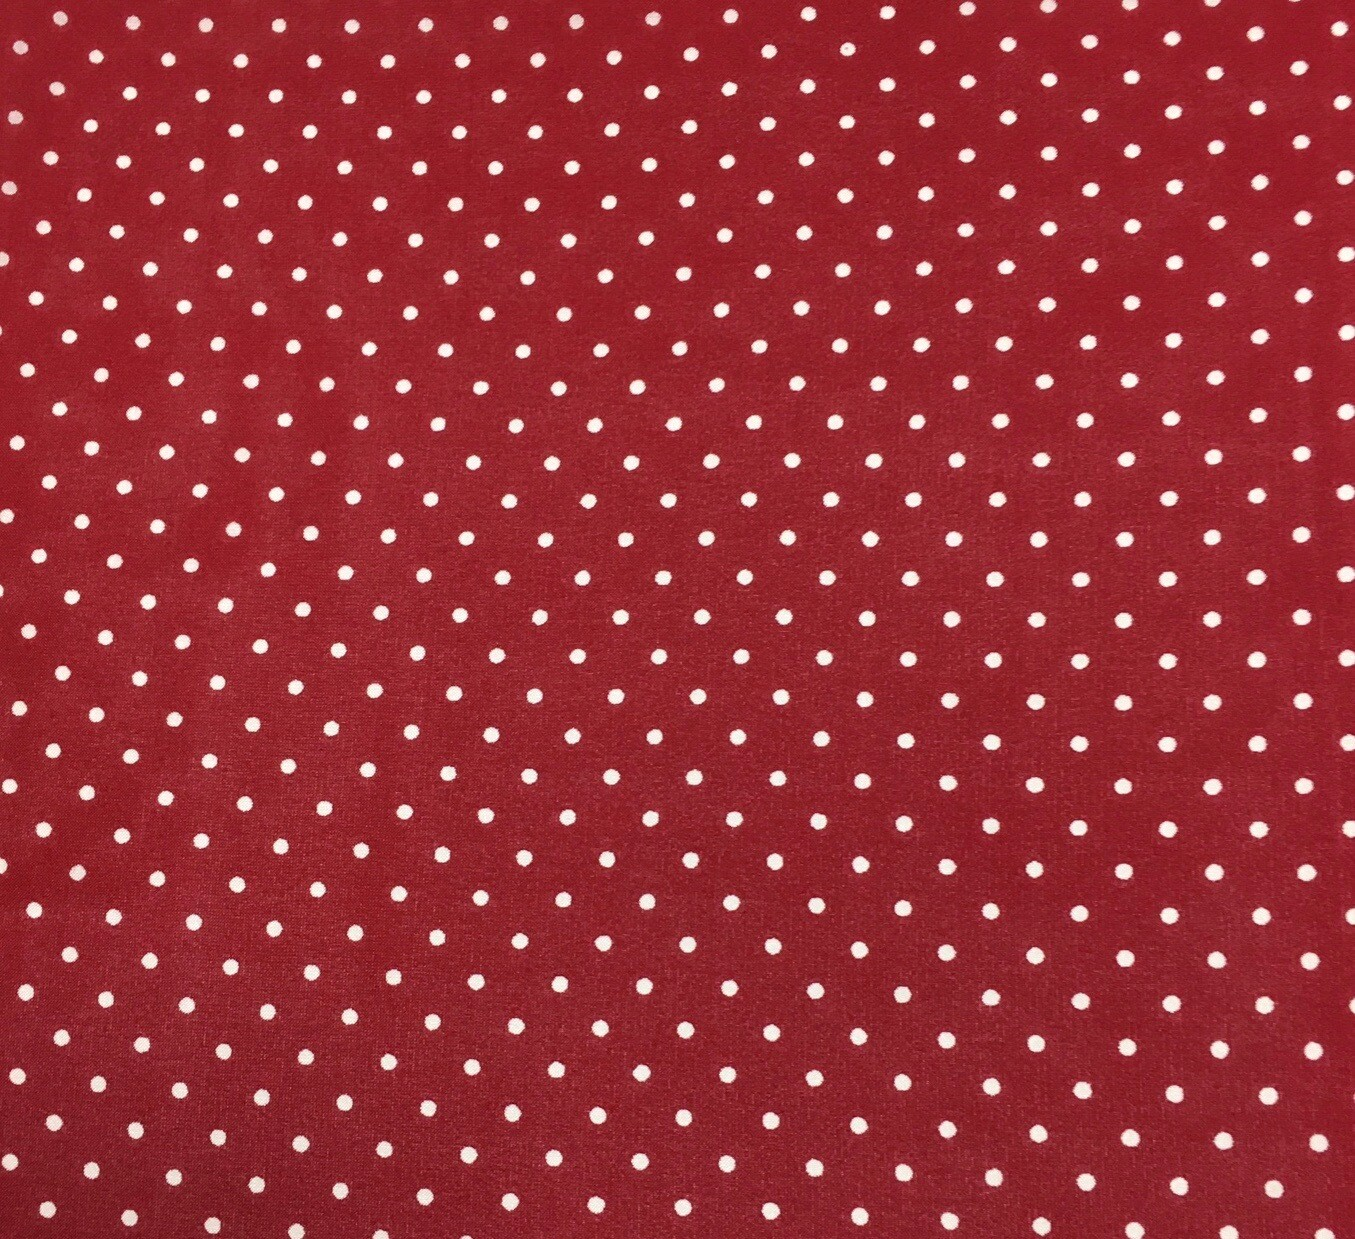 Red Polka Dot Wild Rag